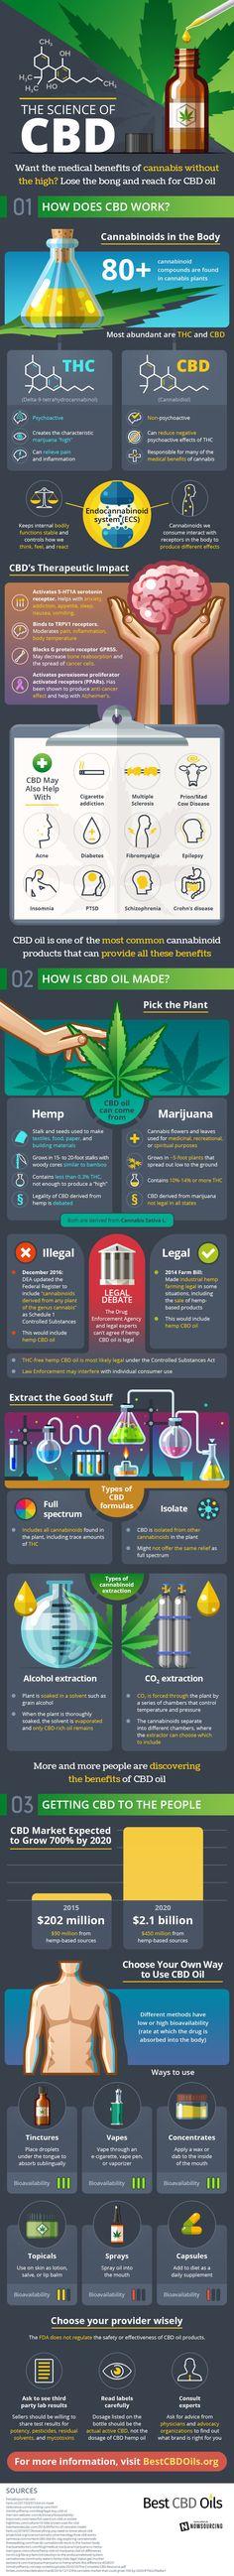 Understanding How CBD Actually Works - Infographic